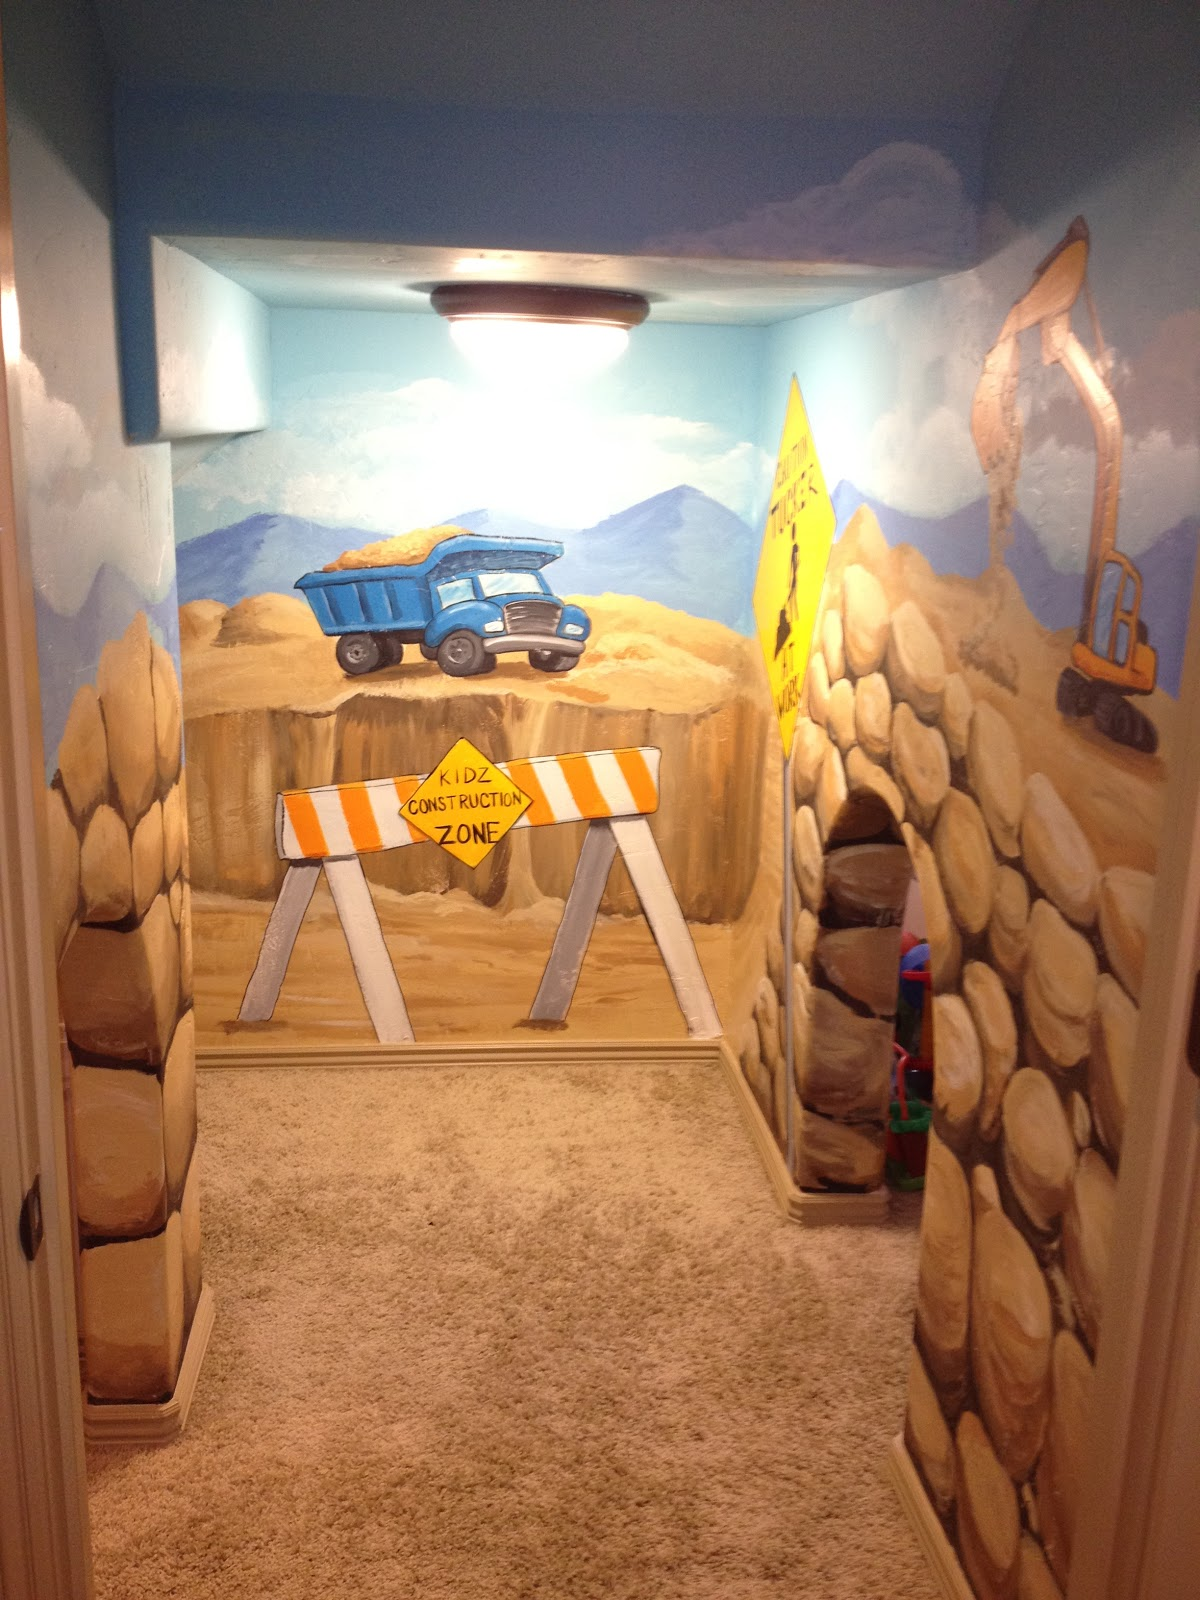 Bawden Fine Murals Construction Zone Playroom Under The